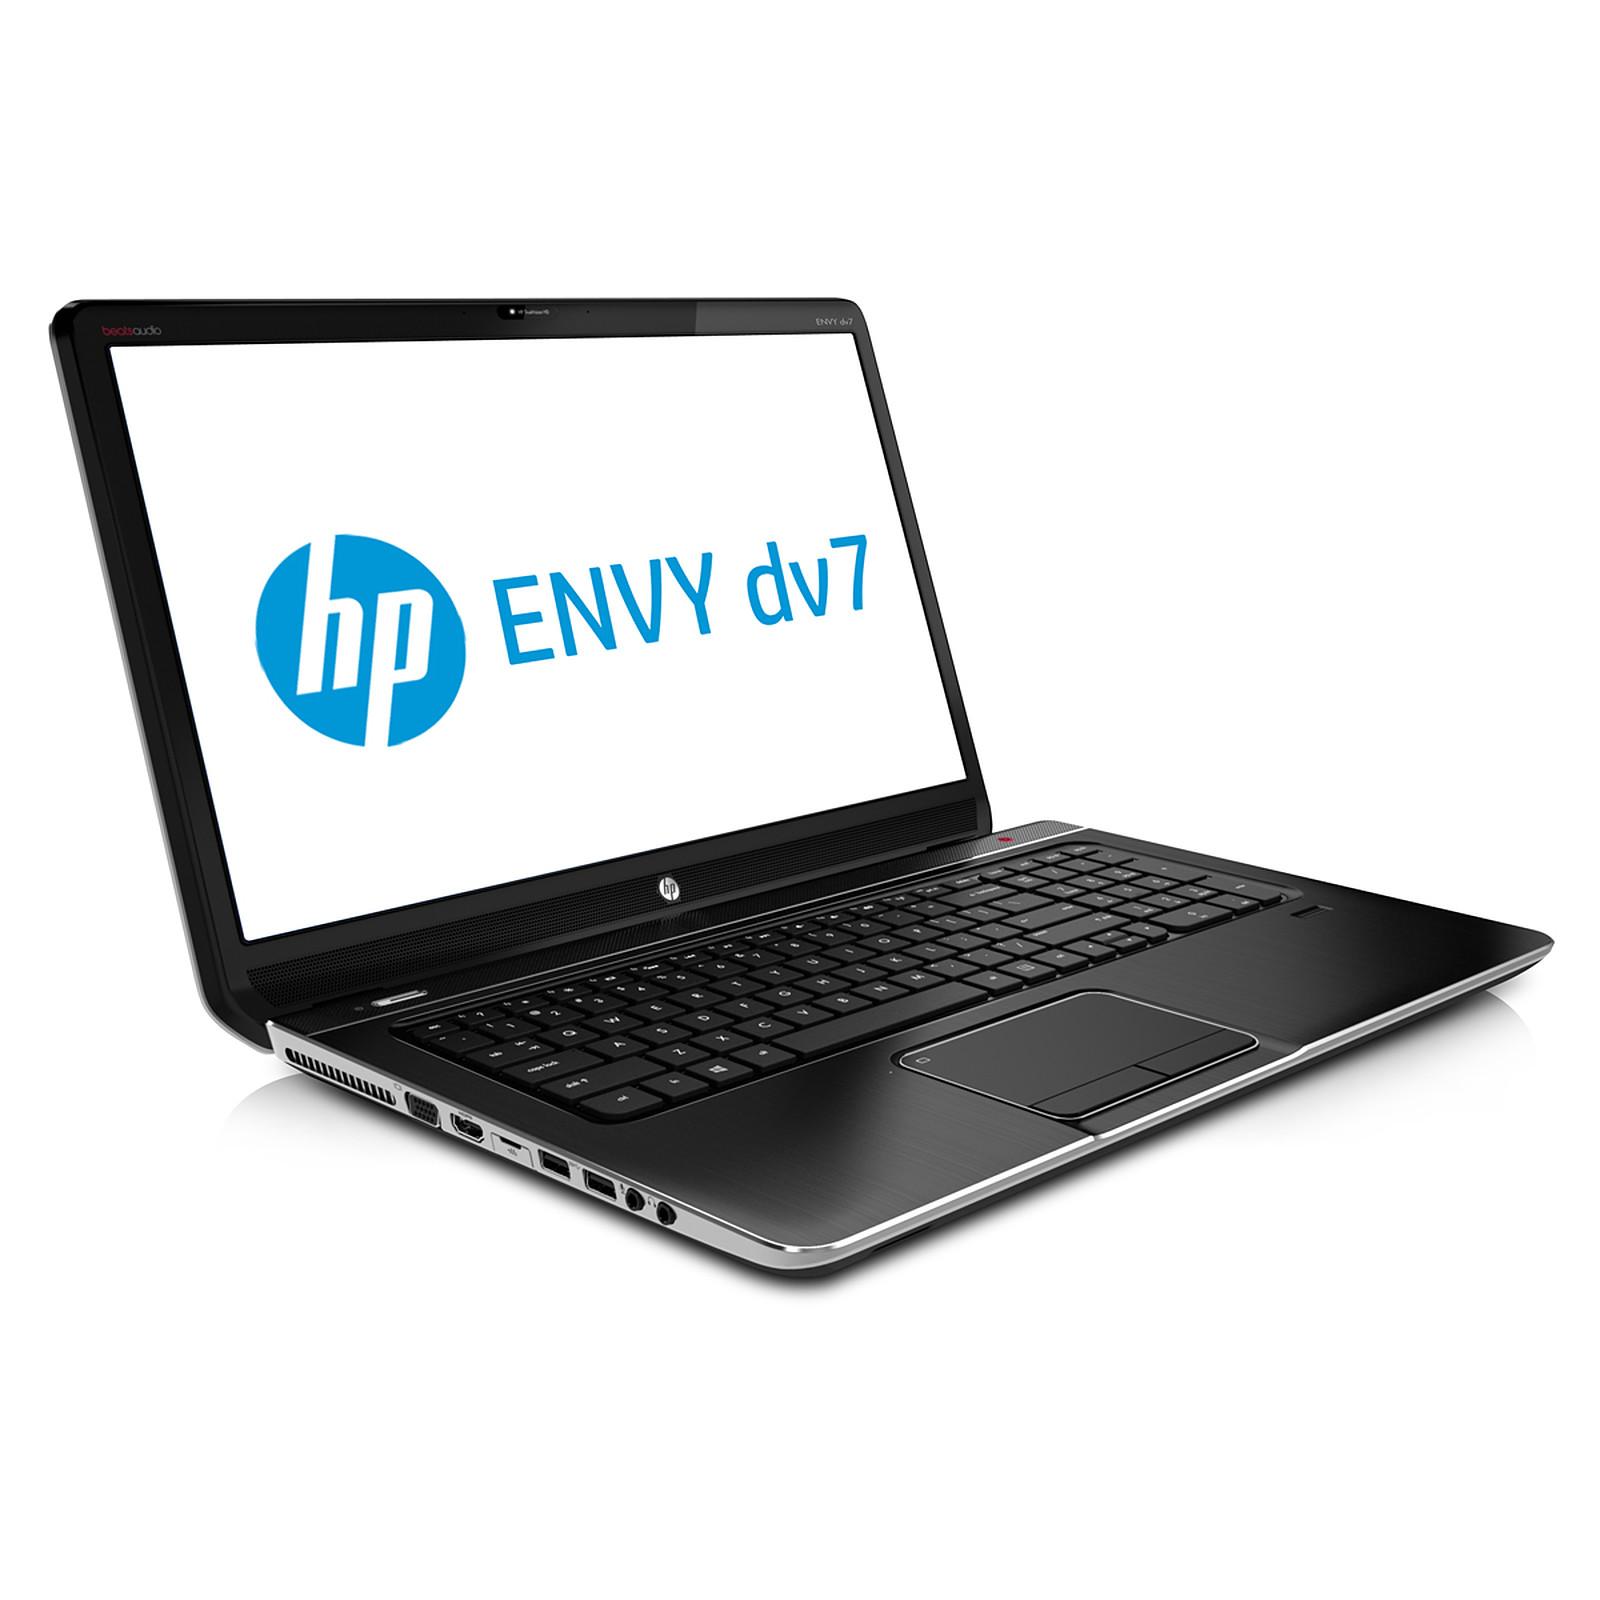 HP ENVY dv7-7290sf